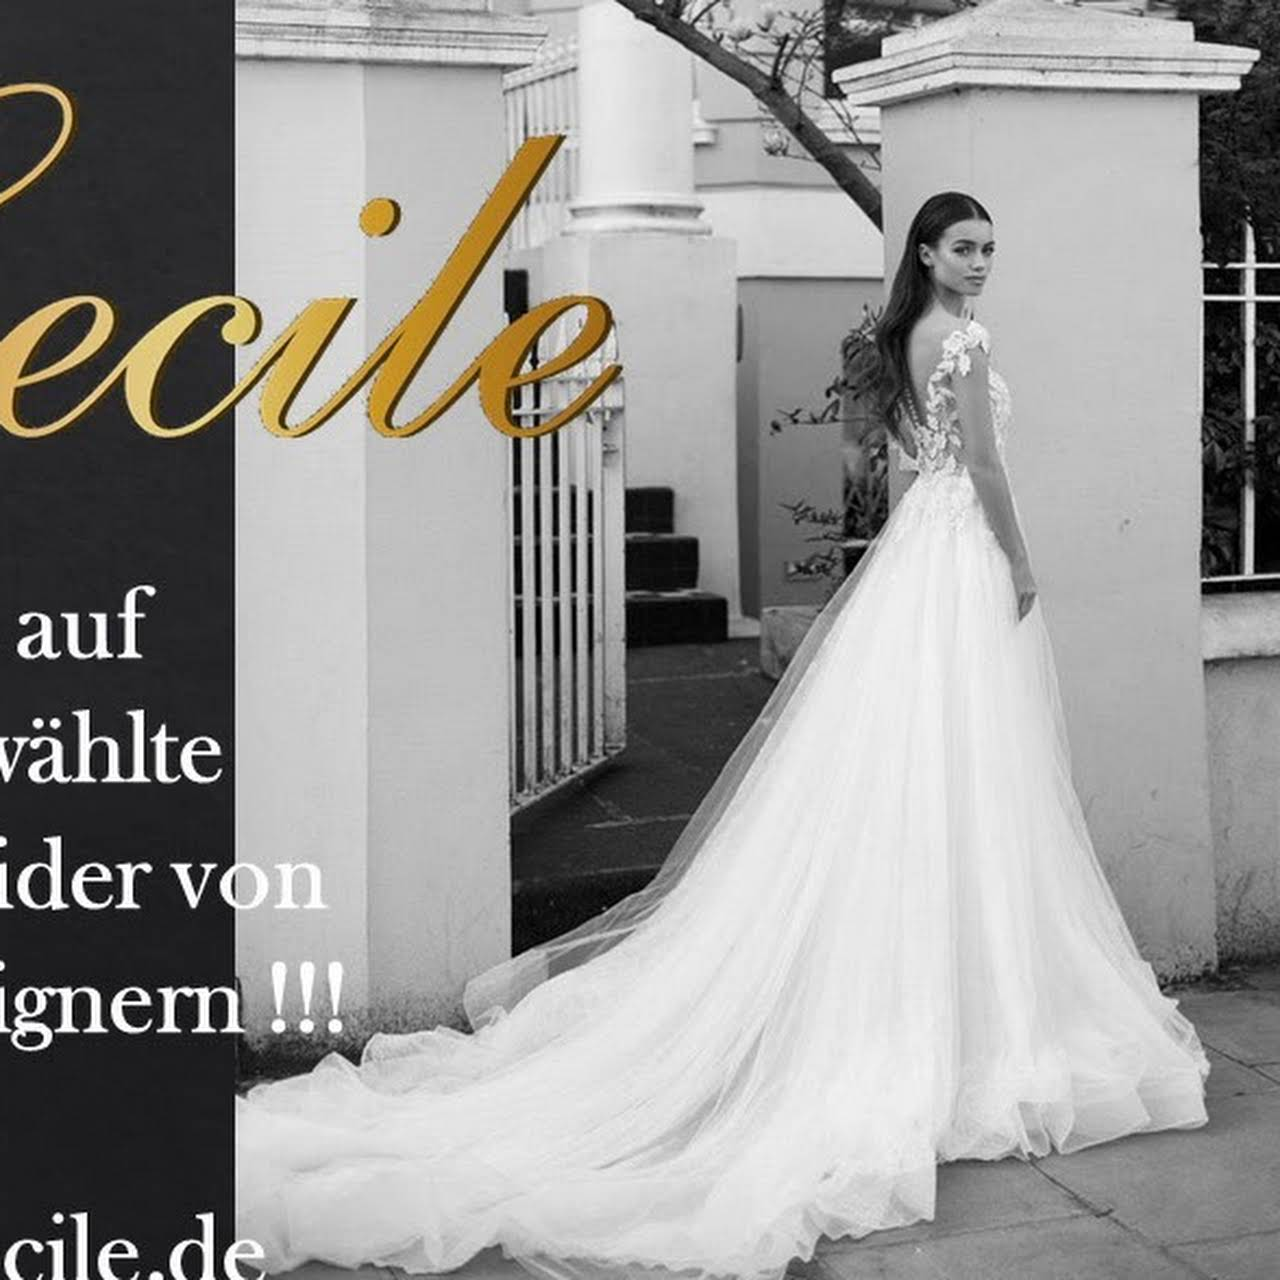 Cecile Brautmode Munchen Brautmodengeschaft In Aschheim